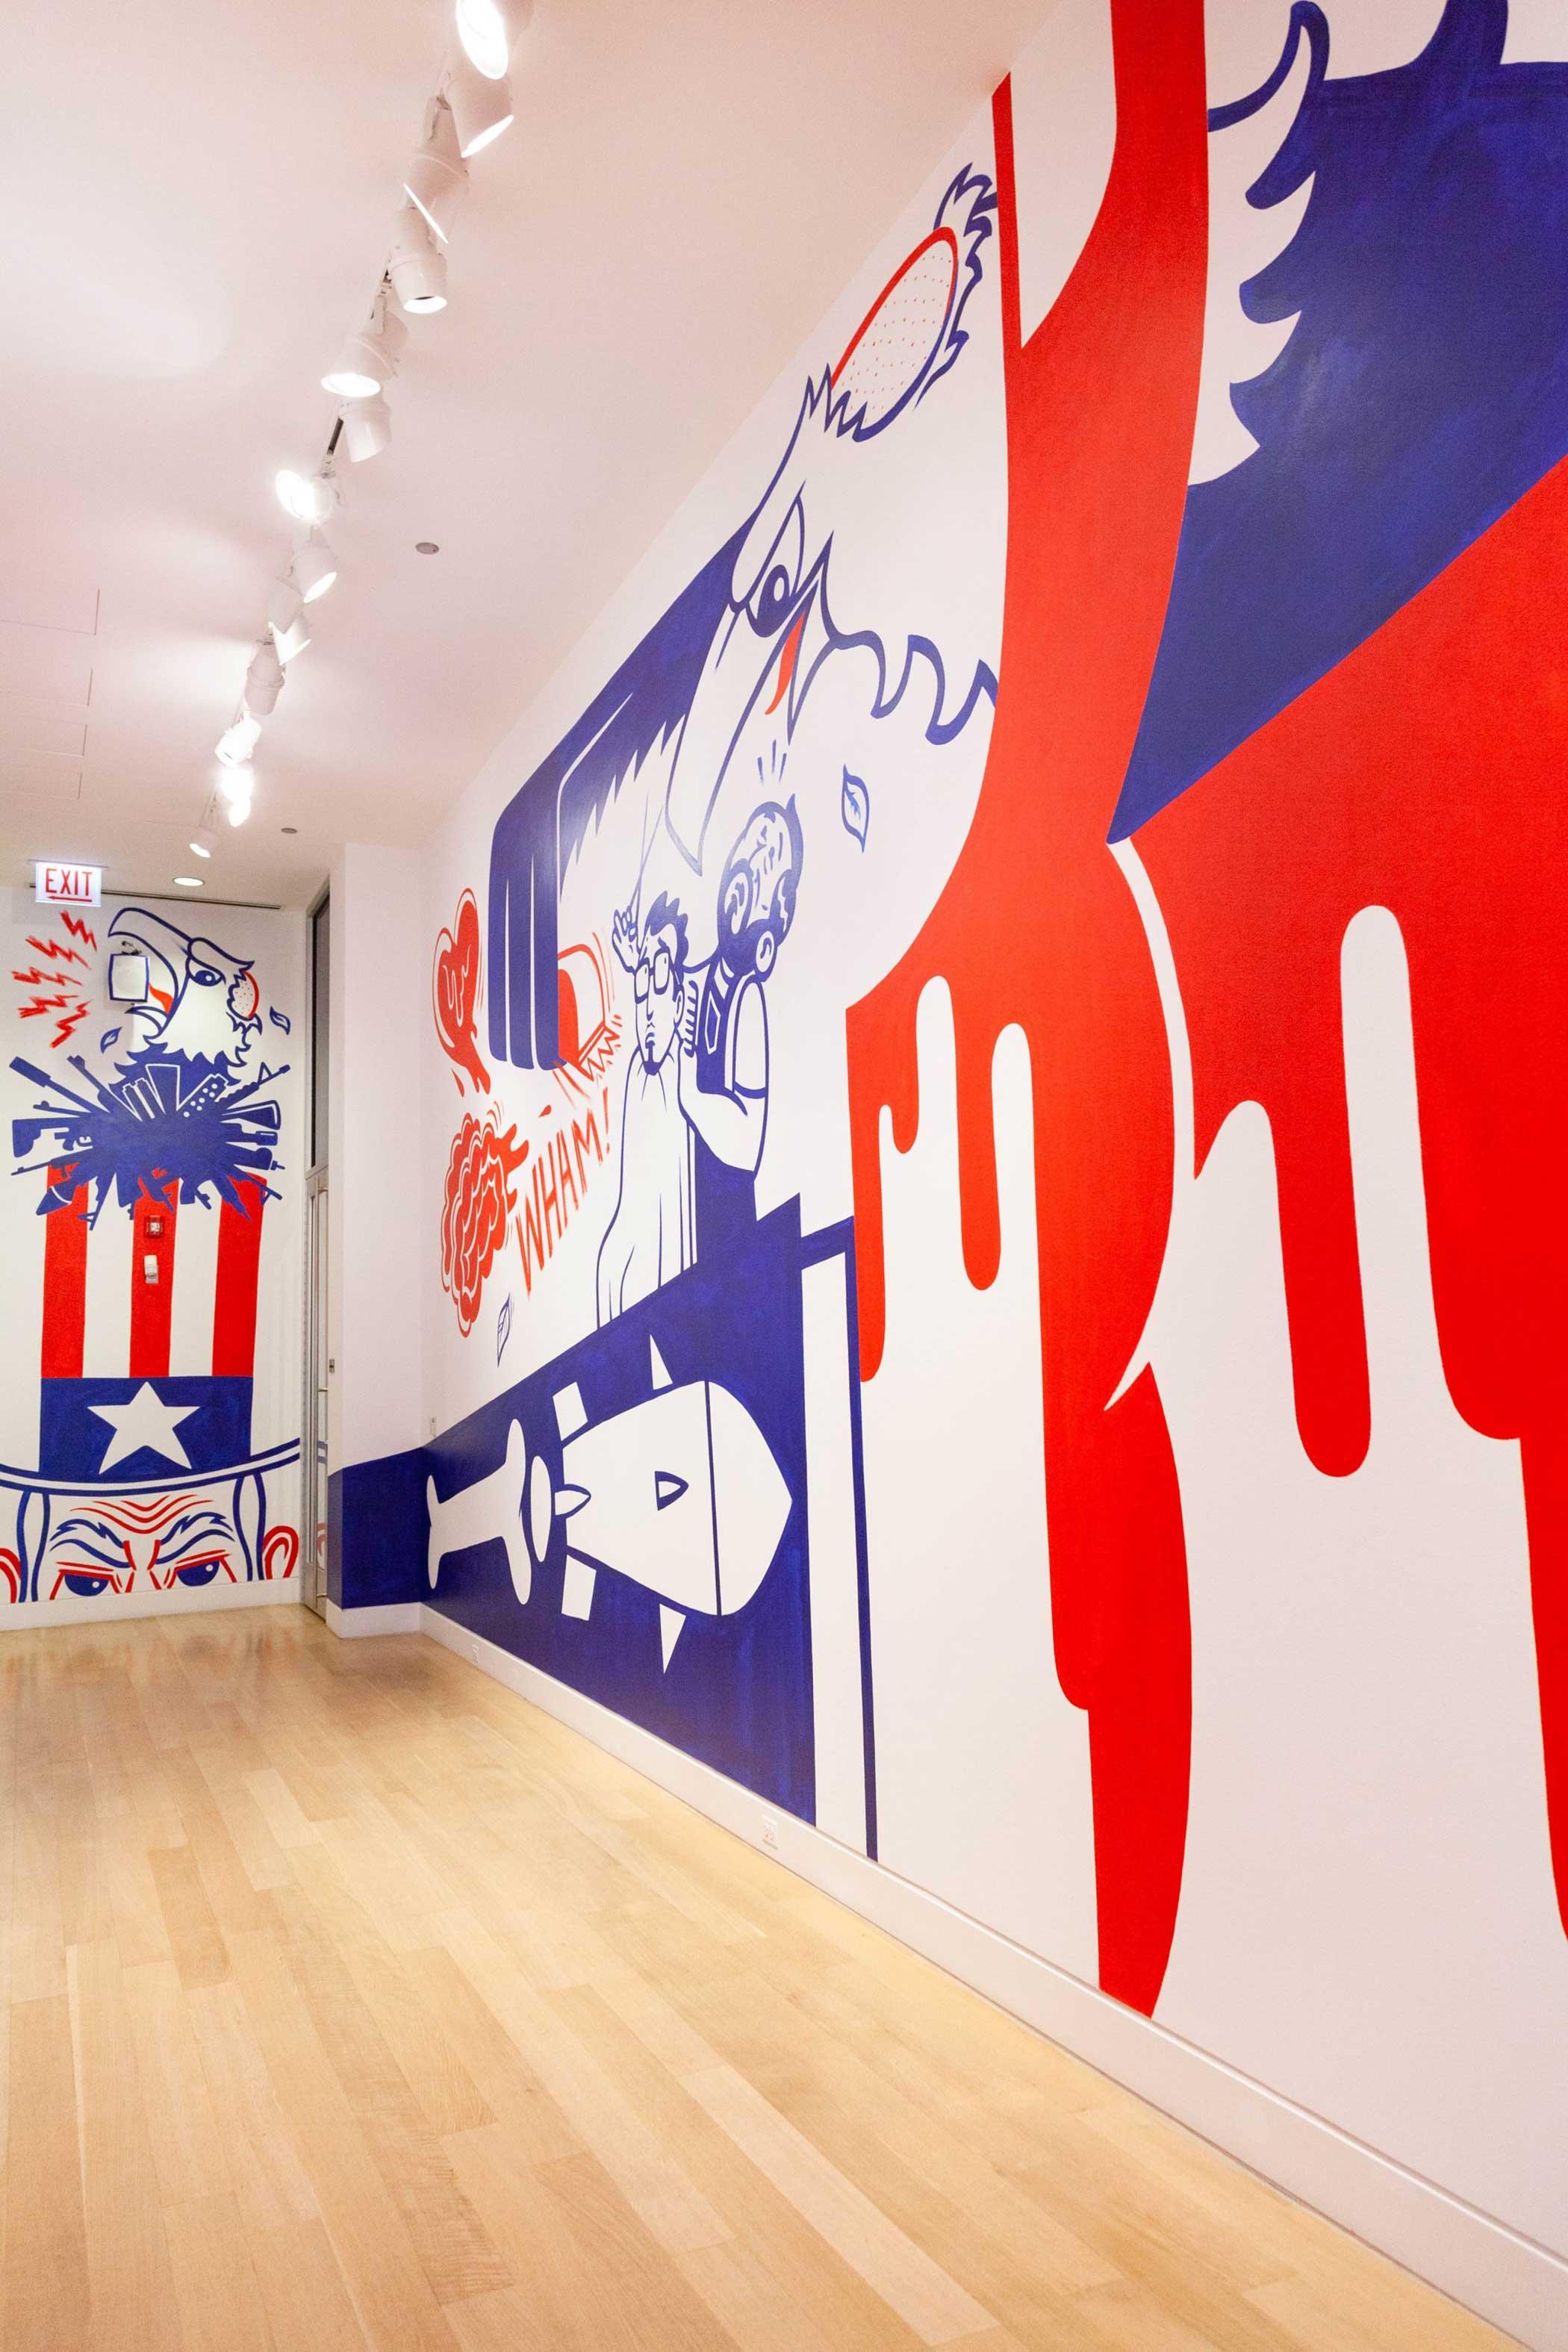 Eric J. Garcia,  The Bald Eagle's Toupee  installation at DePaul Art Museum, 2019.